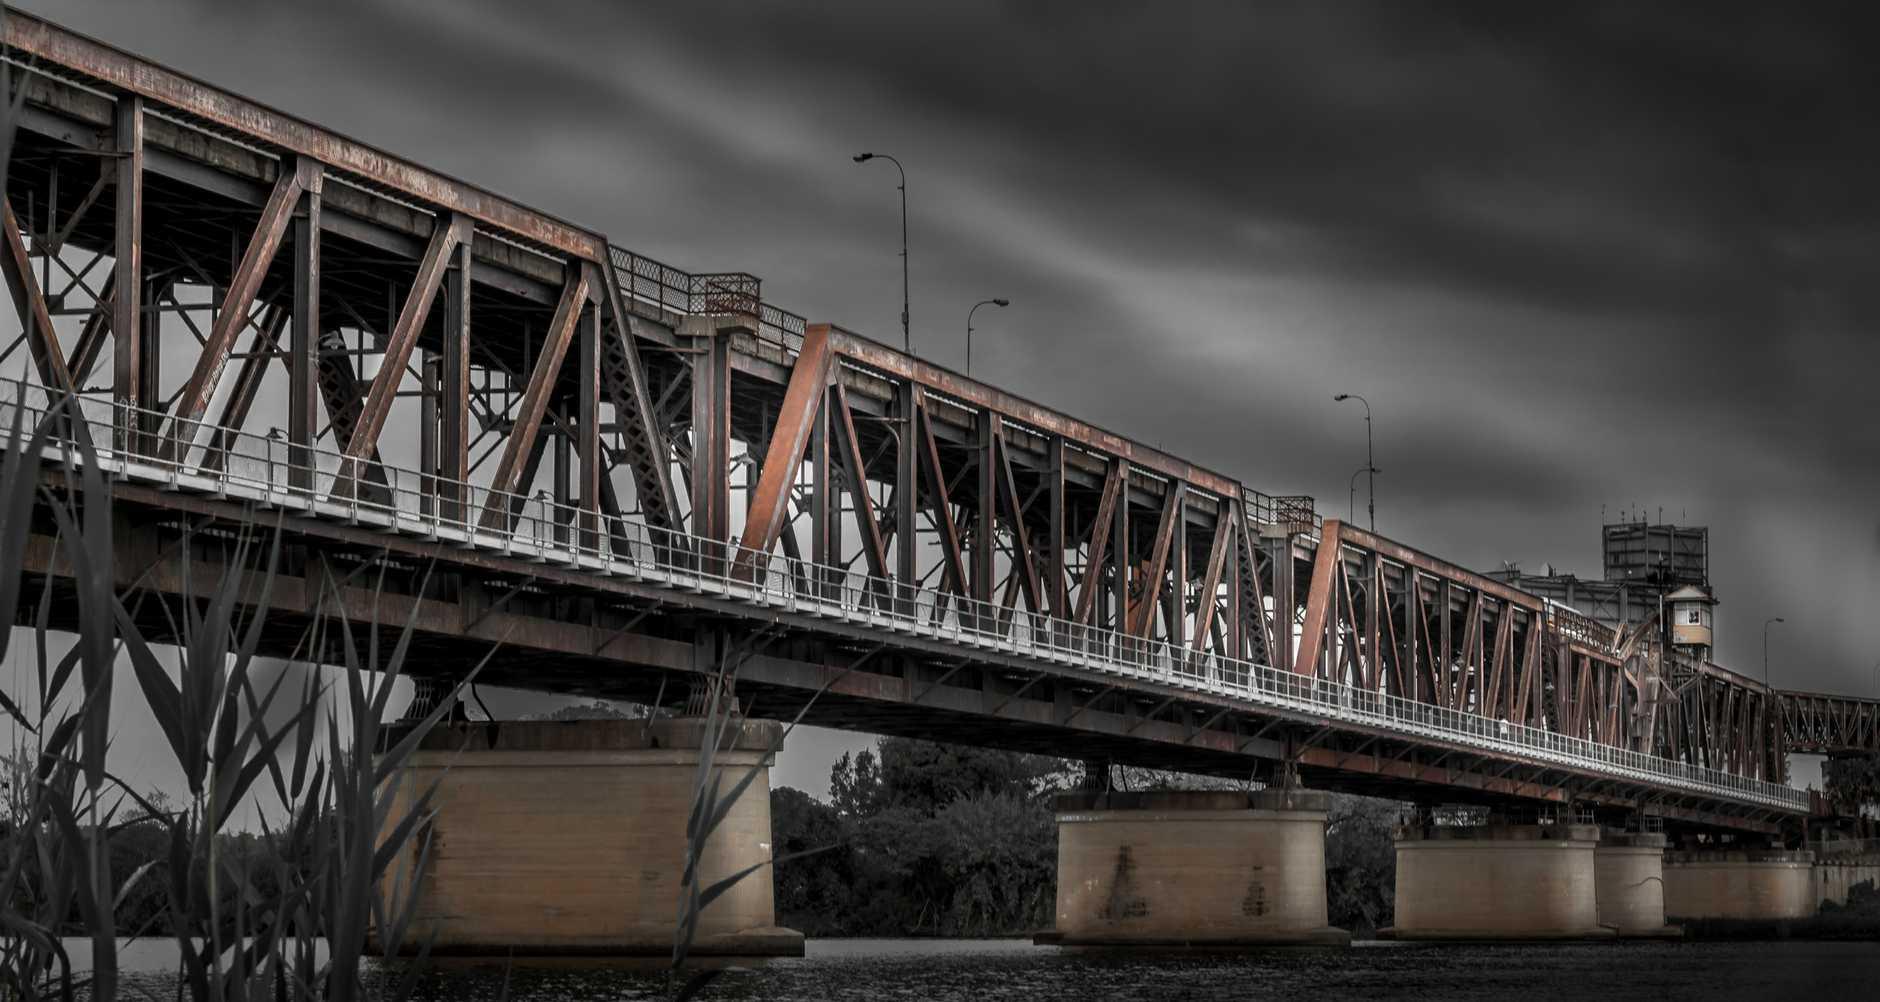 Grafton bridge, (Old Trusty Rusty) - User Contributed